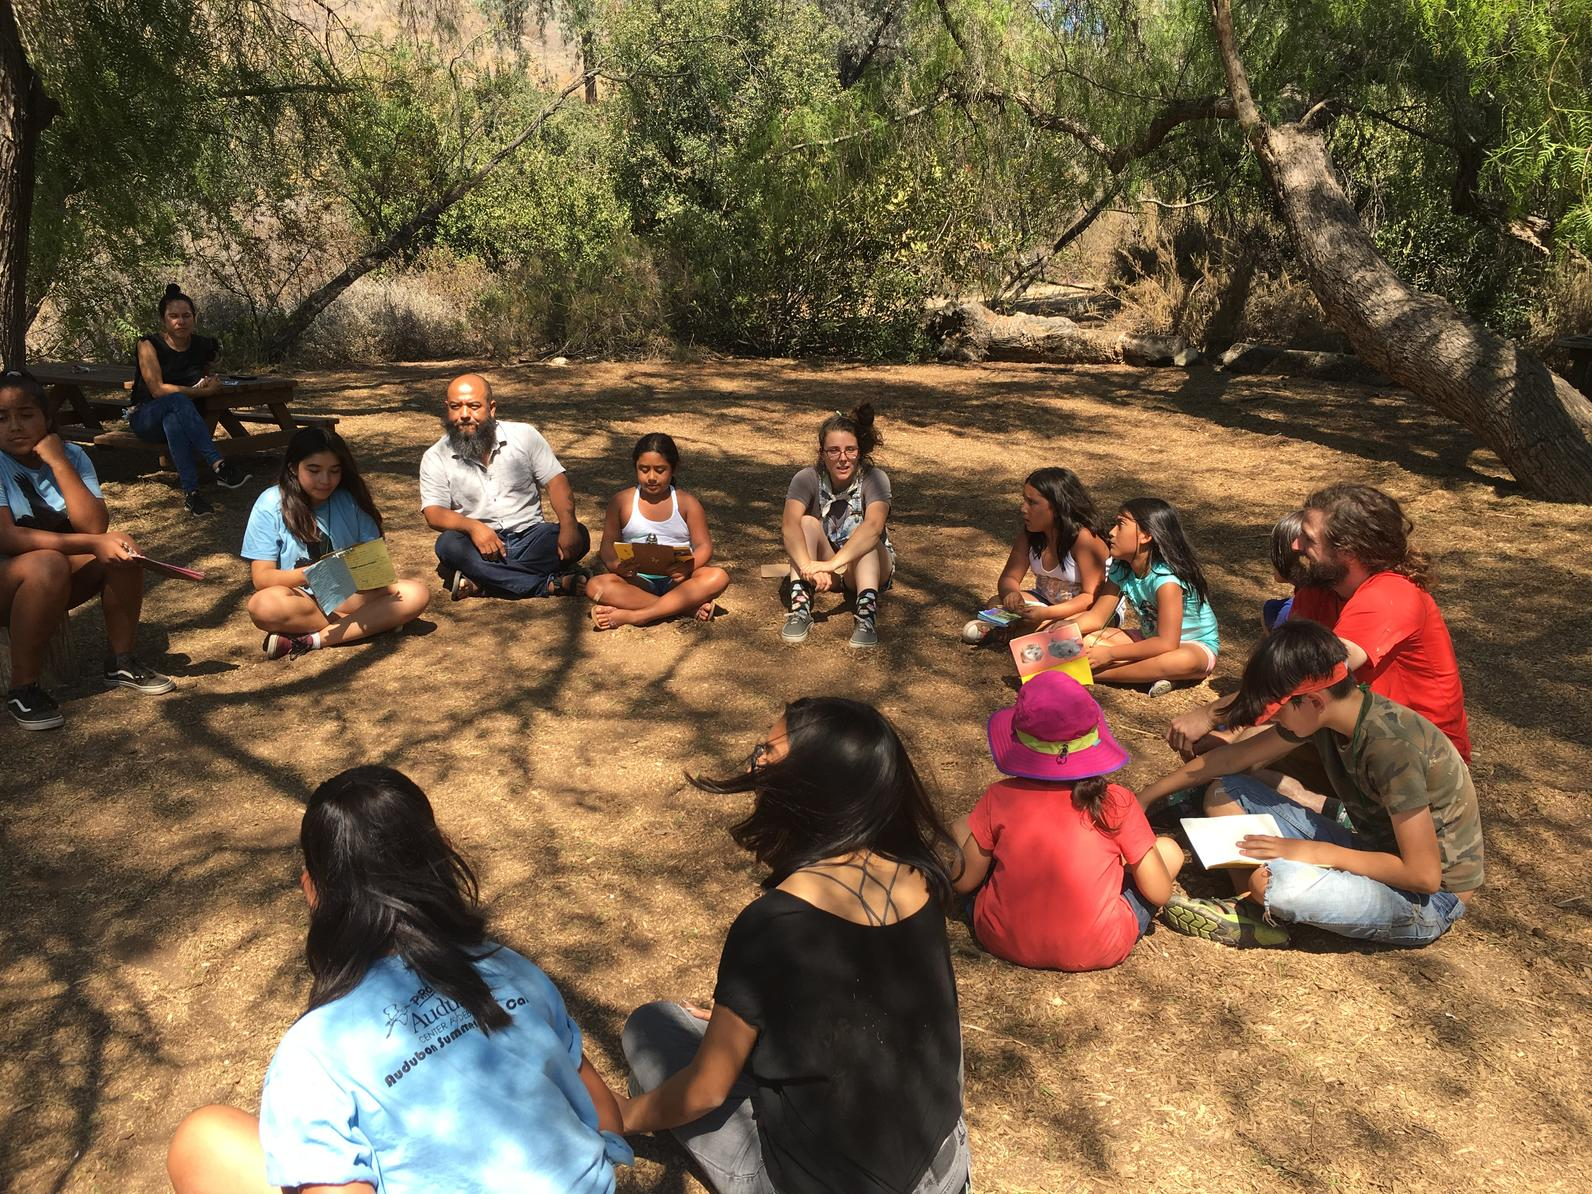 Sharing experiences and observations at Closing Circle